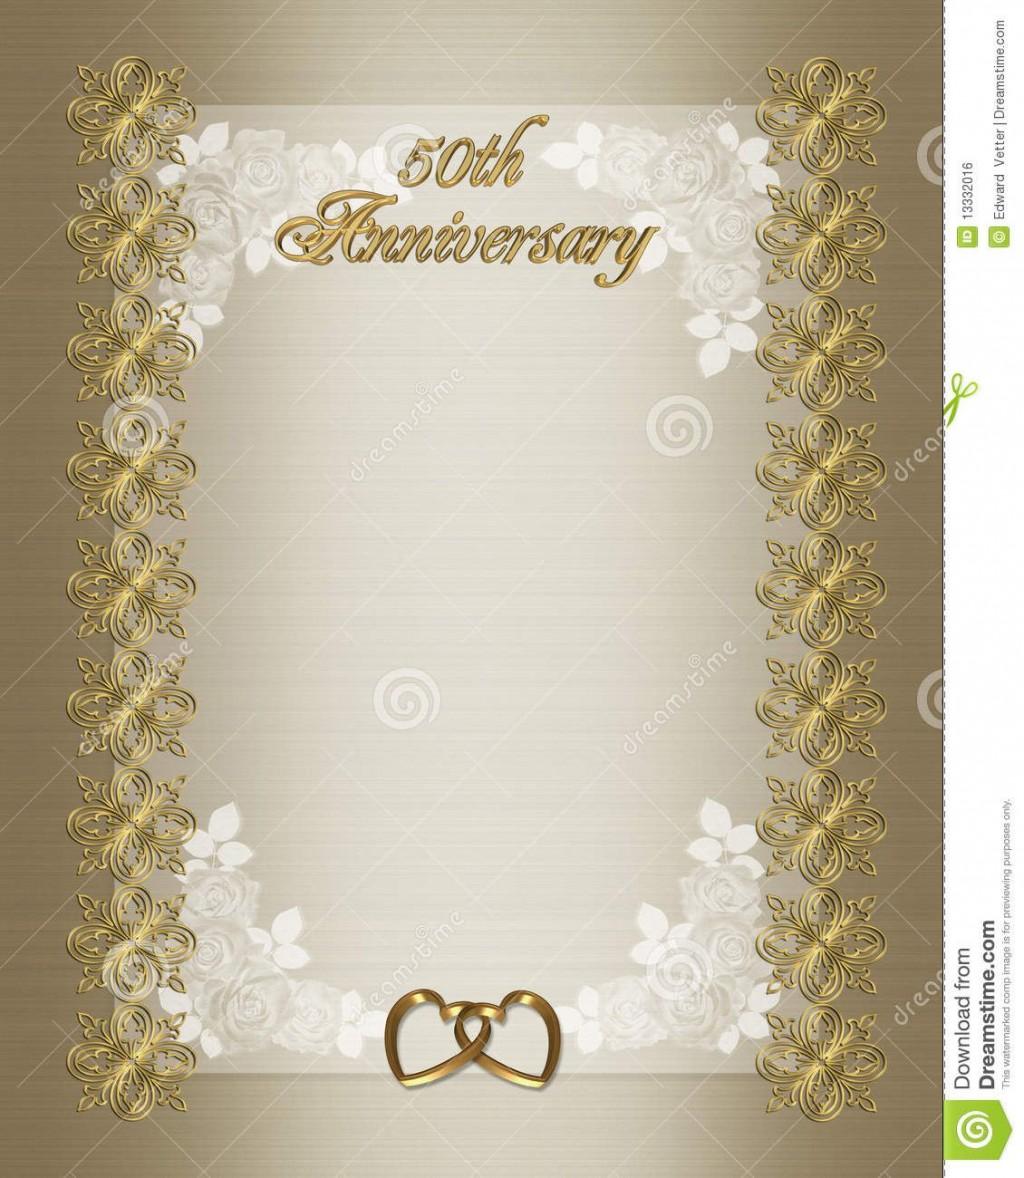 003 Unforgettable 50th Wedding Anniversary Invitation Card Sample Design  WordingLarge